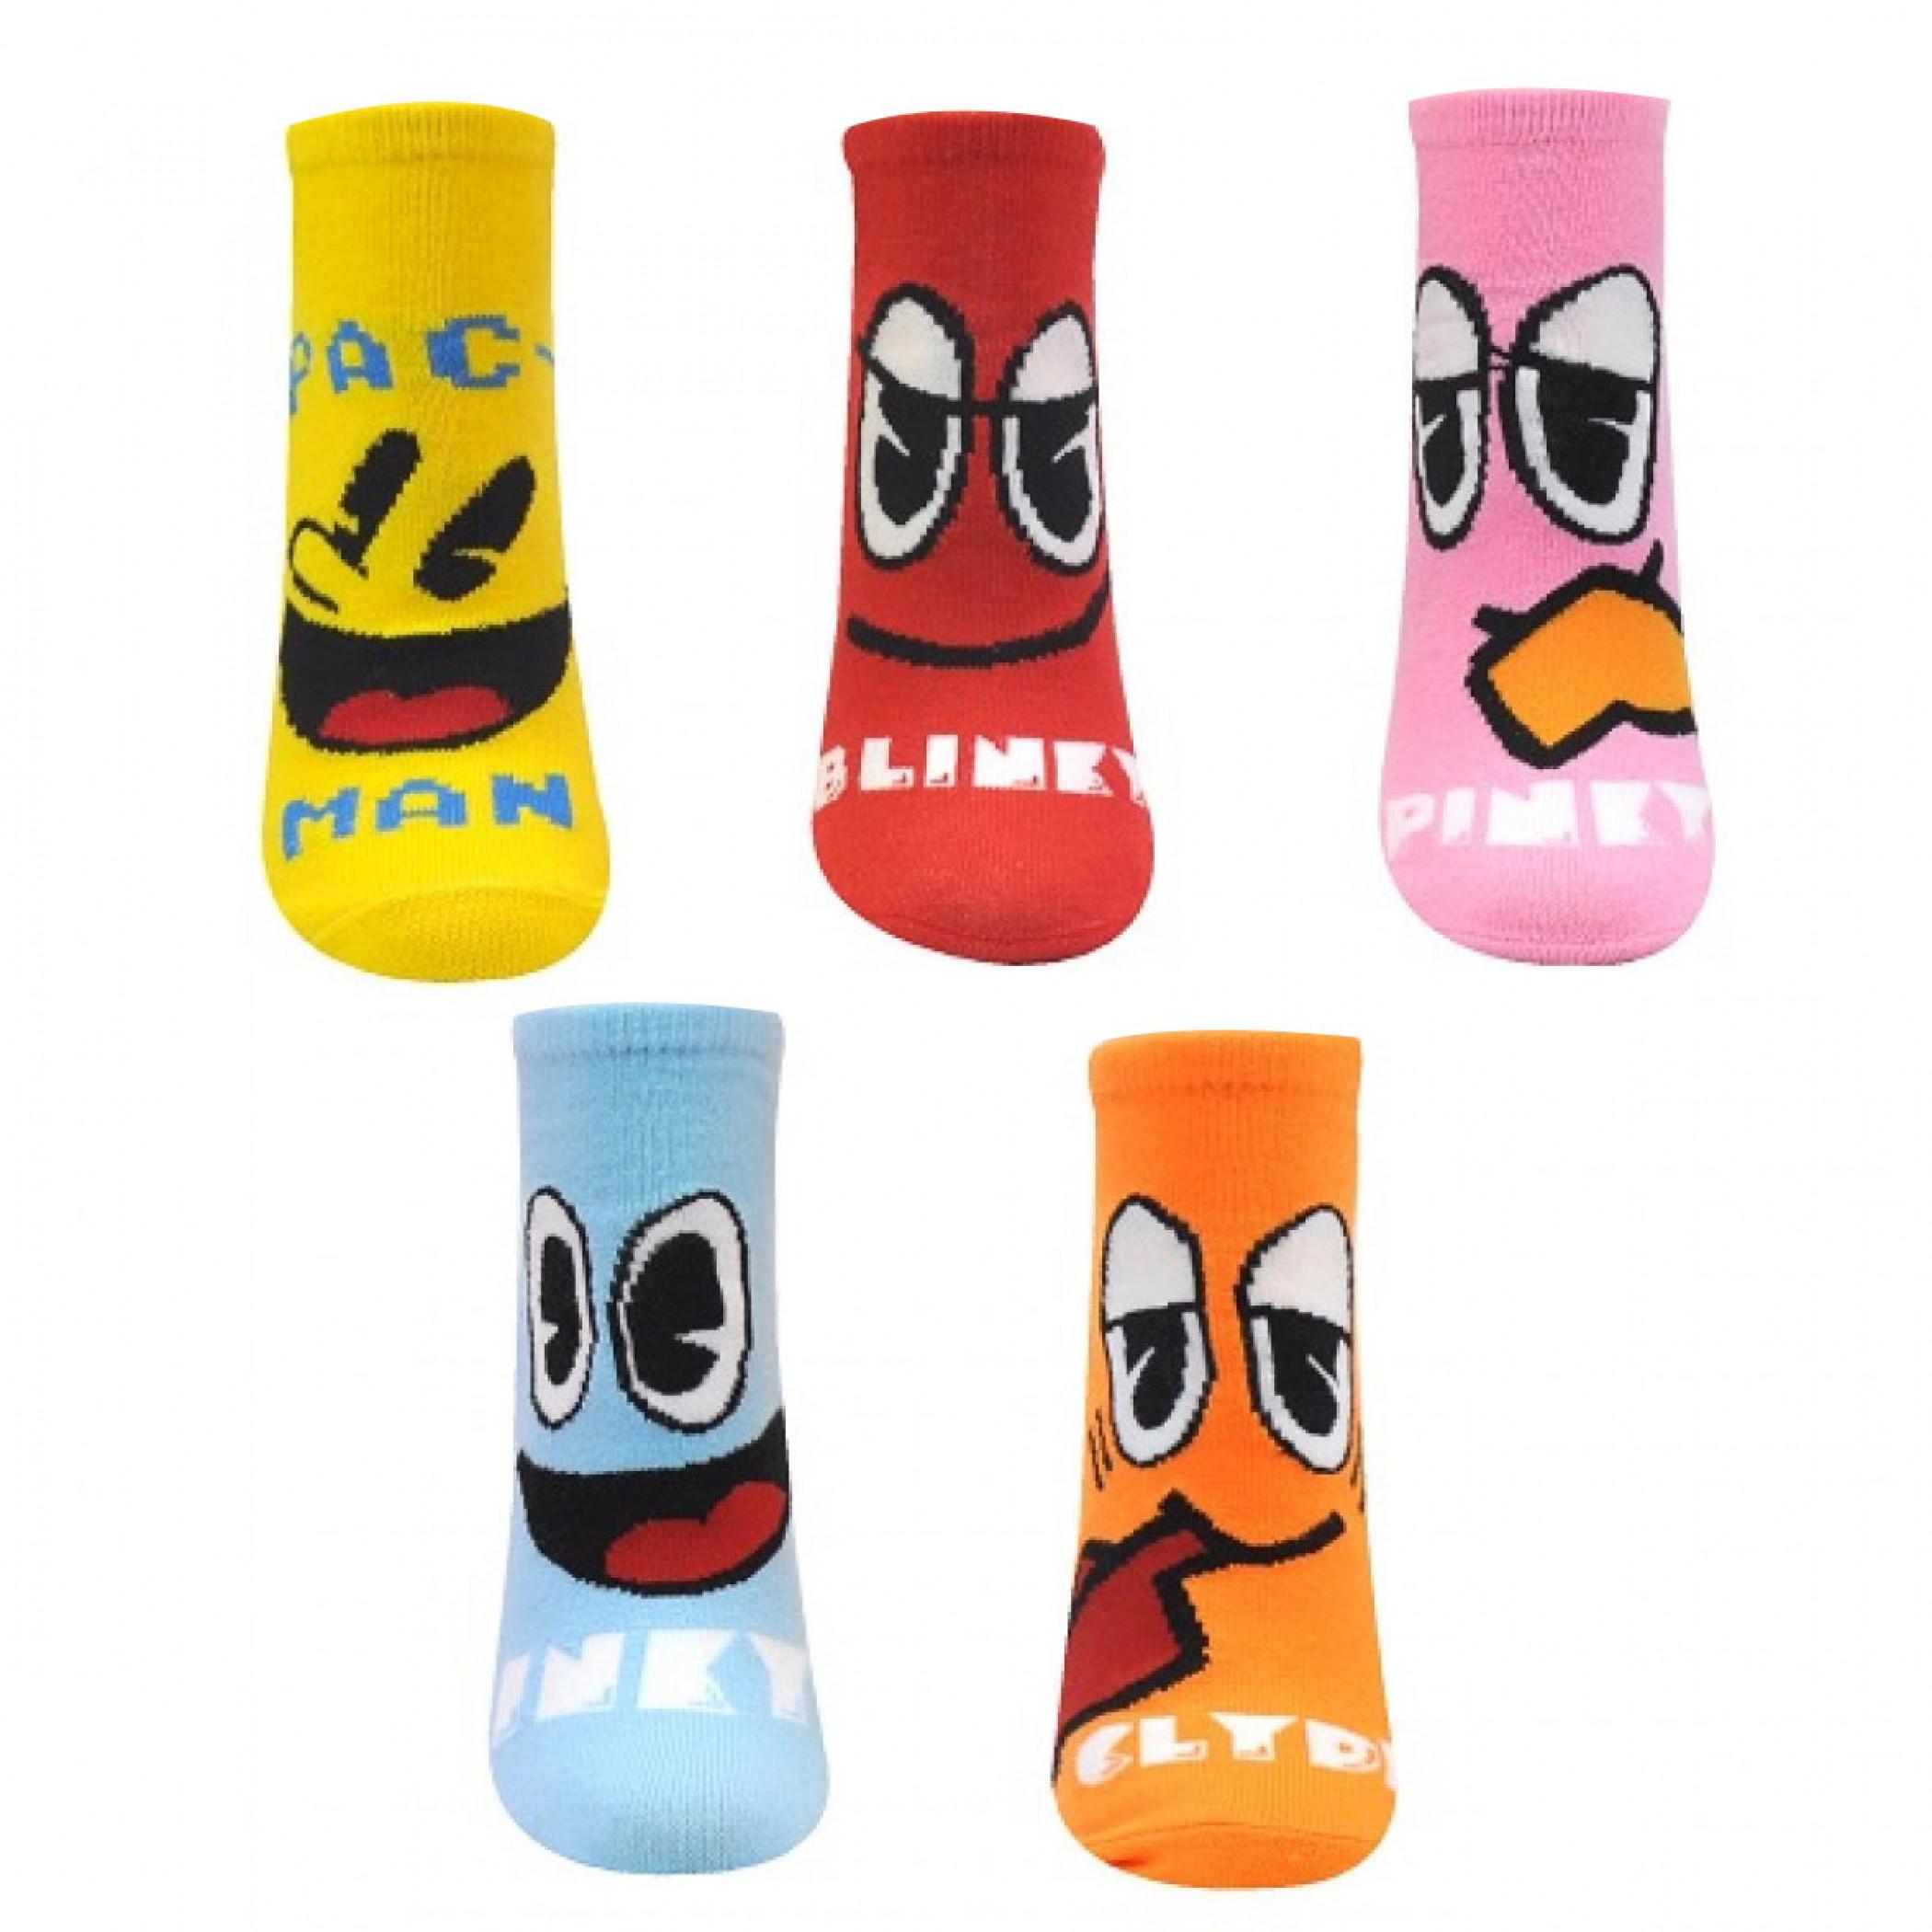 PAC-MAN 5-Pair Pack of Low Cut Socks